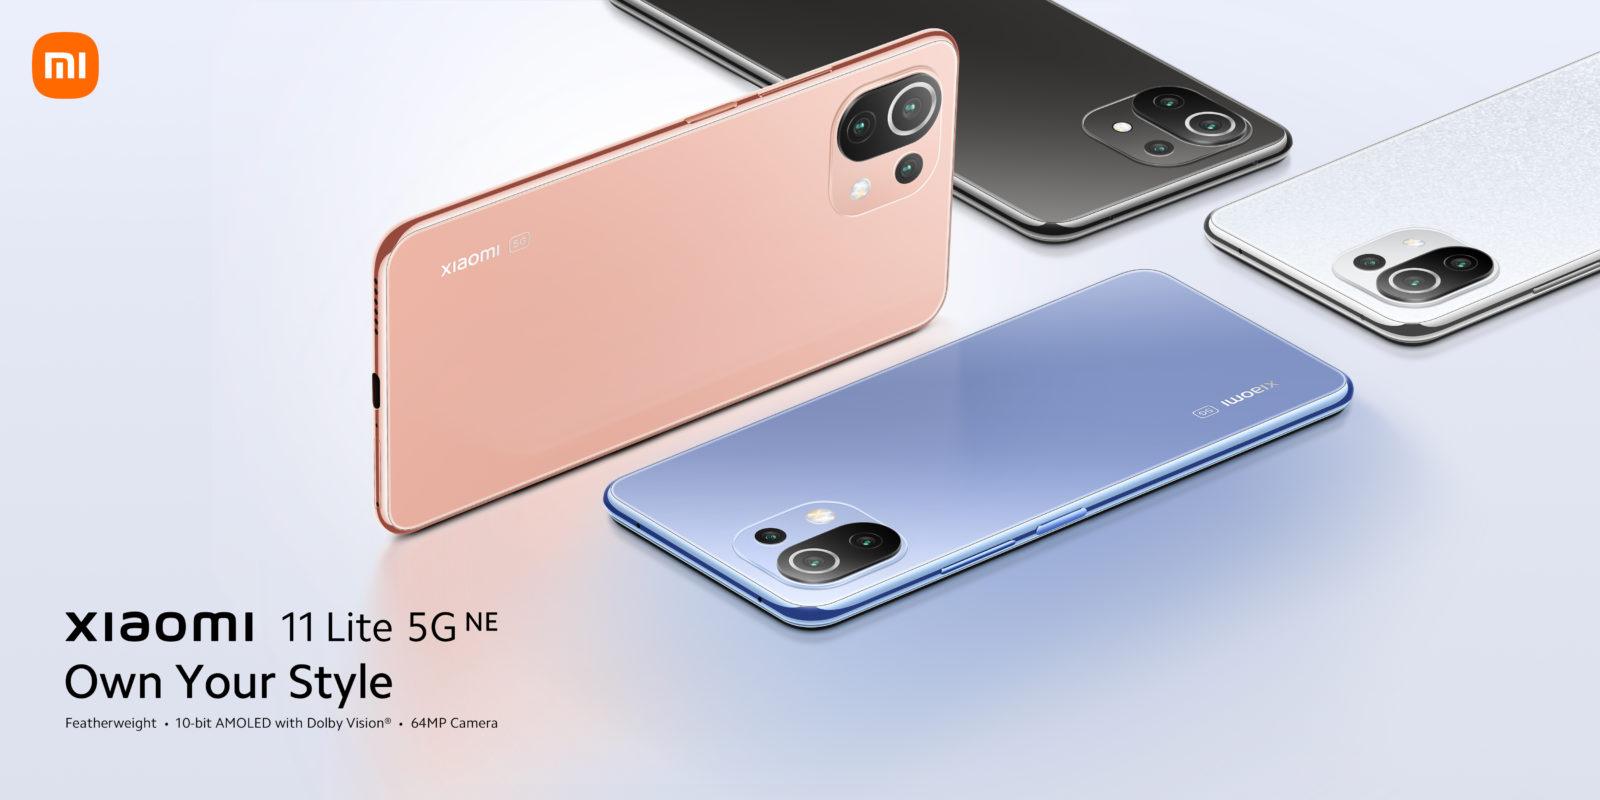 Make a fashion statement with the all-new Xiaomi 11 Lite 5G NE